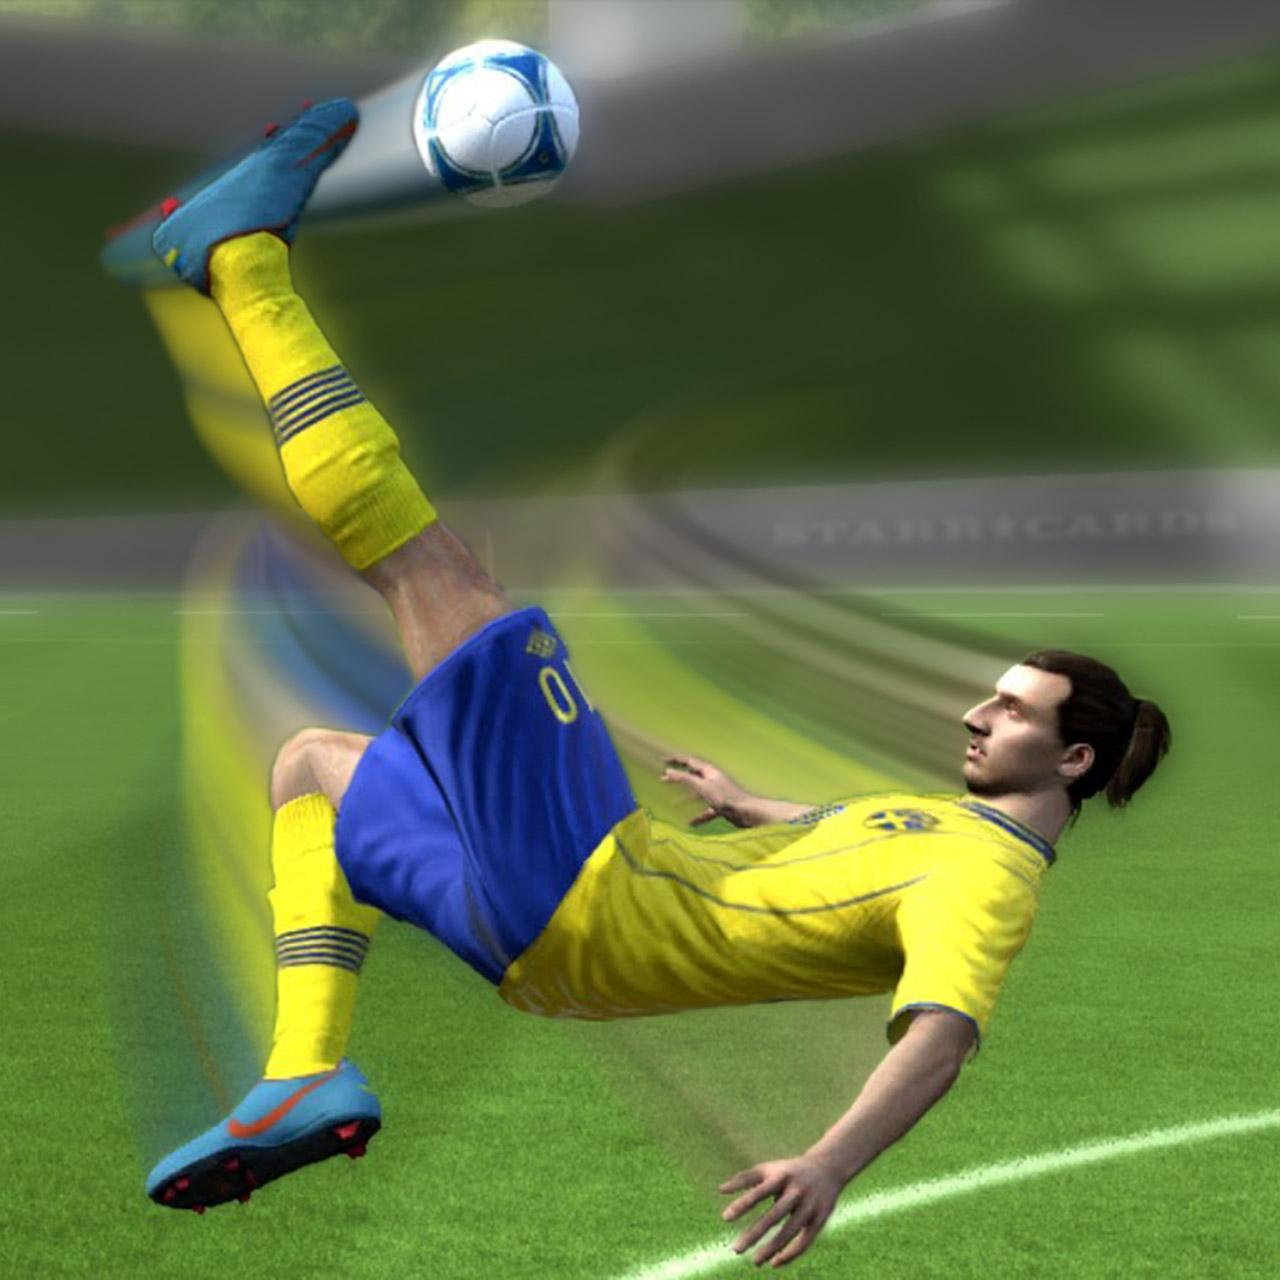 15 soccer stars reveal favorite goal: Zlatan Ibrahimovic ...